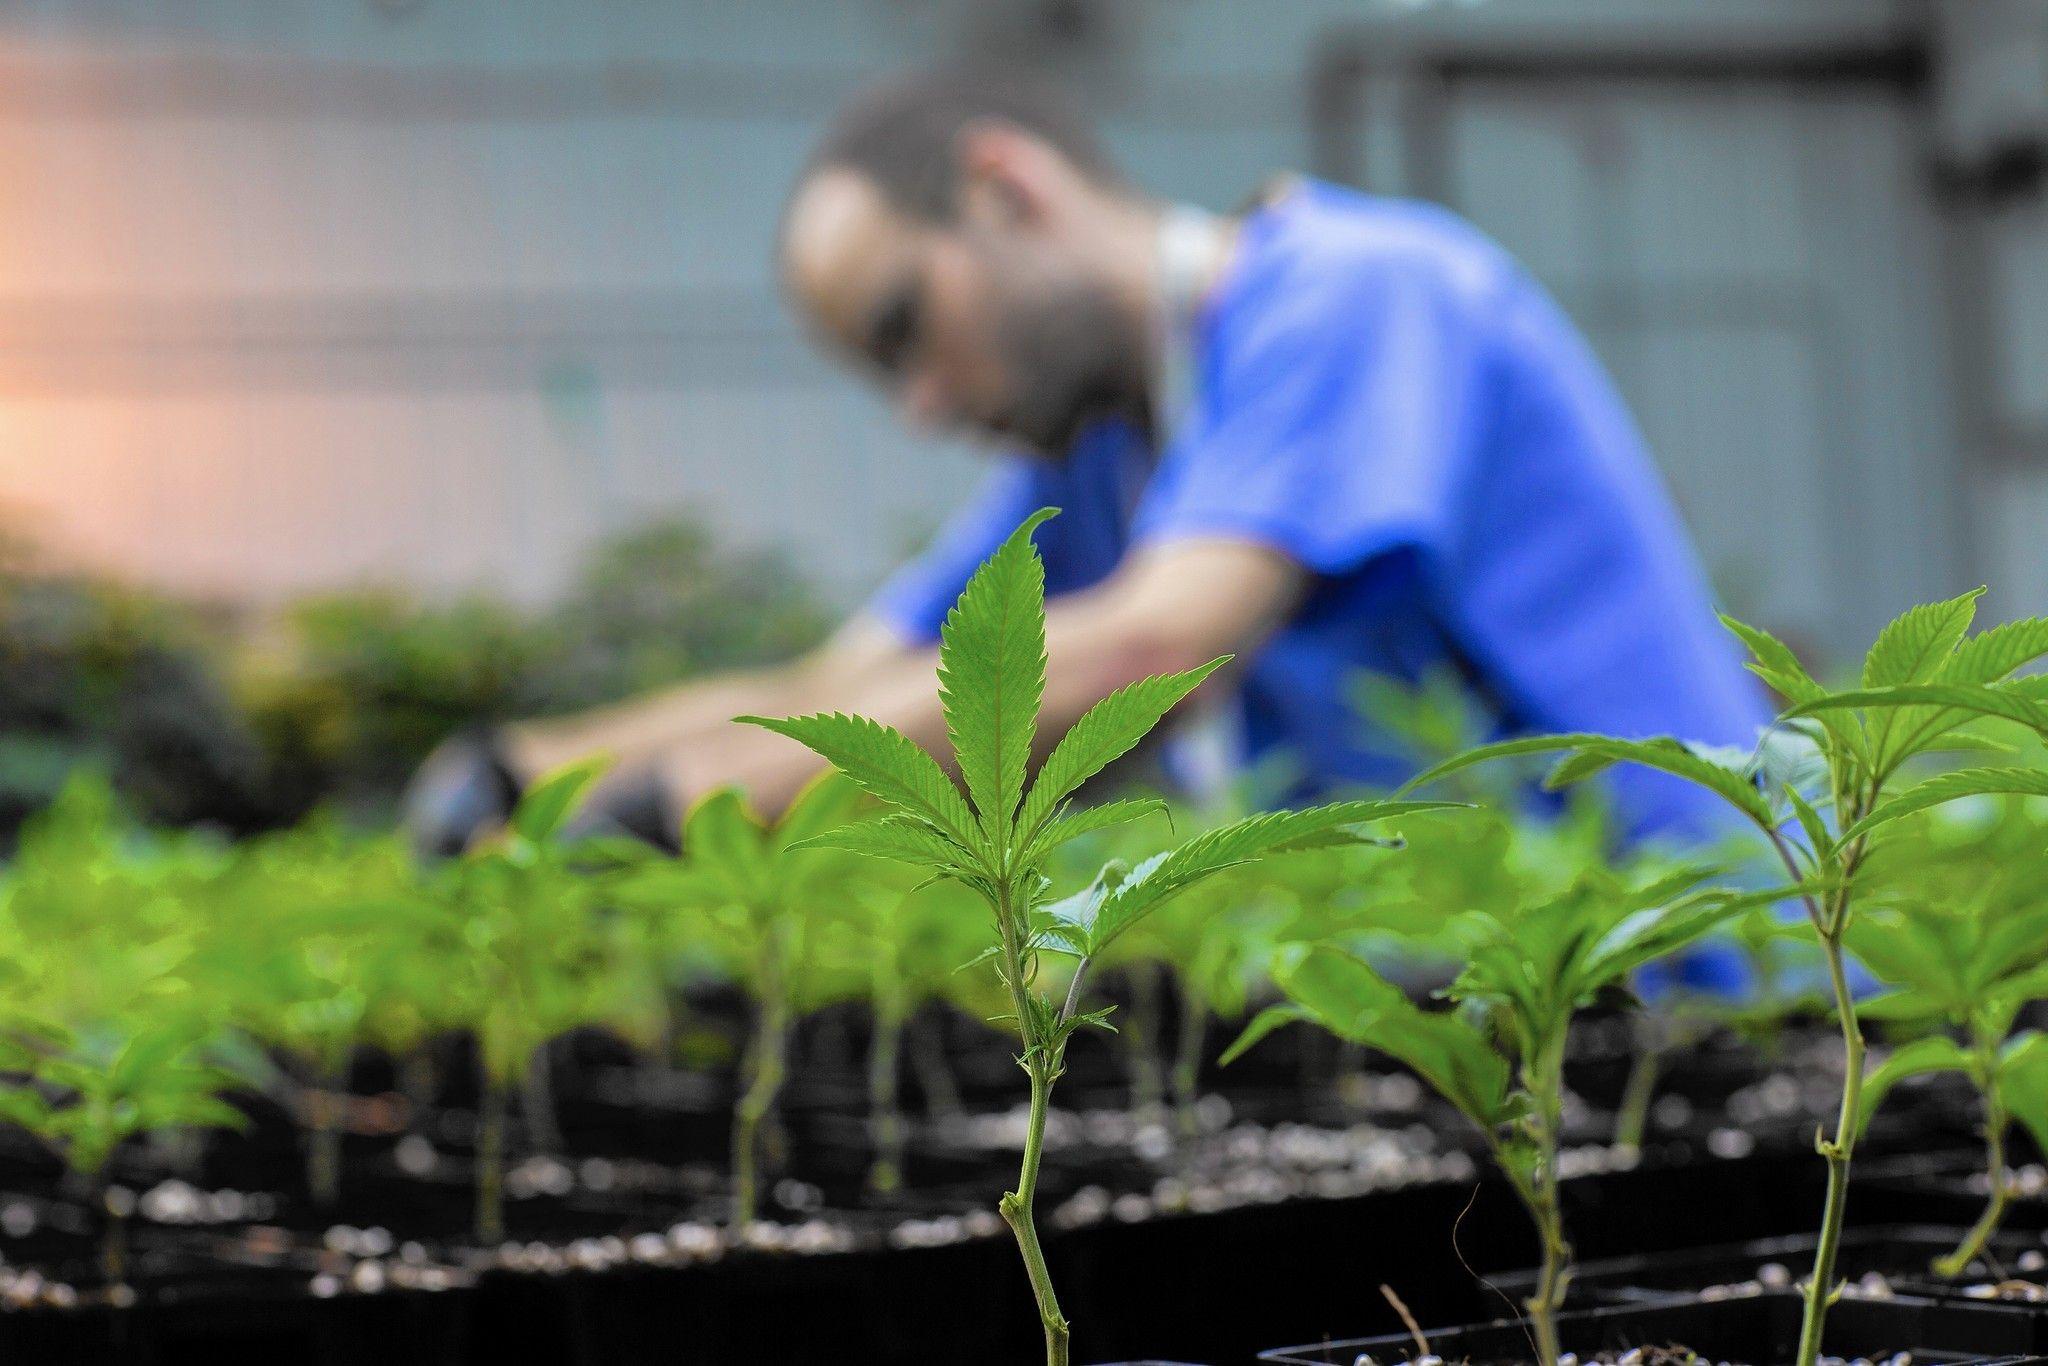 Medical marijuana companies in Illinois battle growing pains